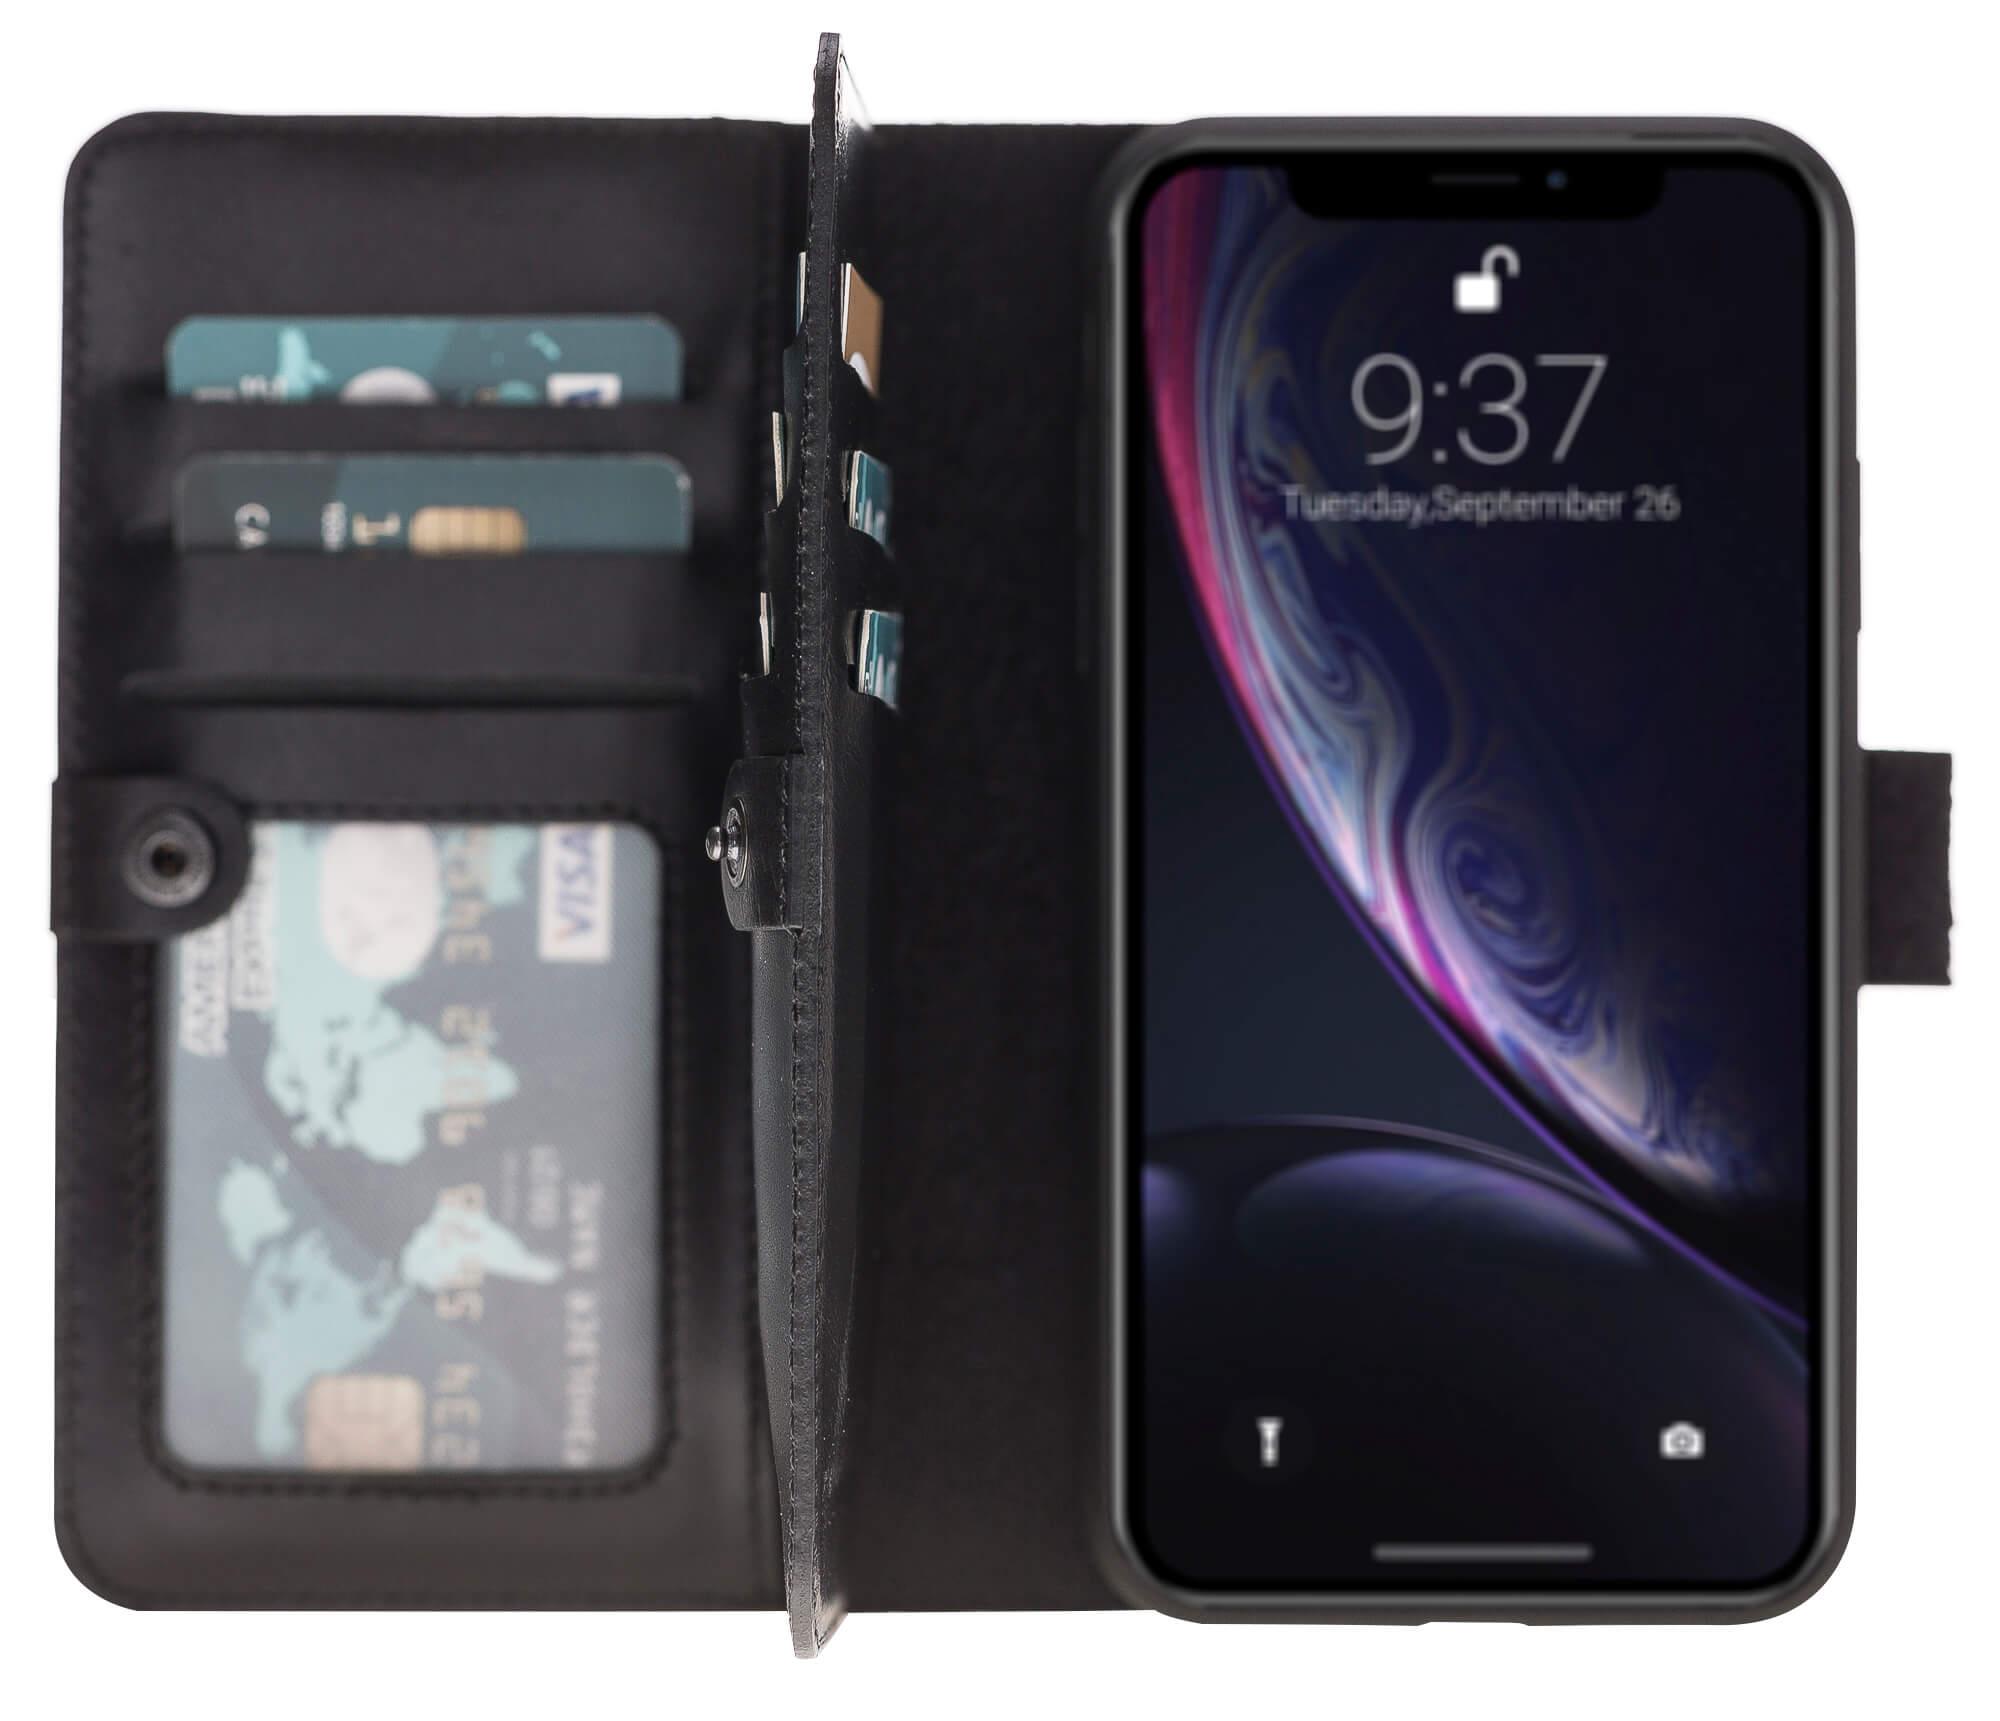 "iPhone Xr abnehmbare Lederhülle ""Darian"" inkl. Kartenfächer in Schwarz inkl. Edler Geschenkverpackung"